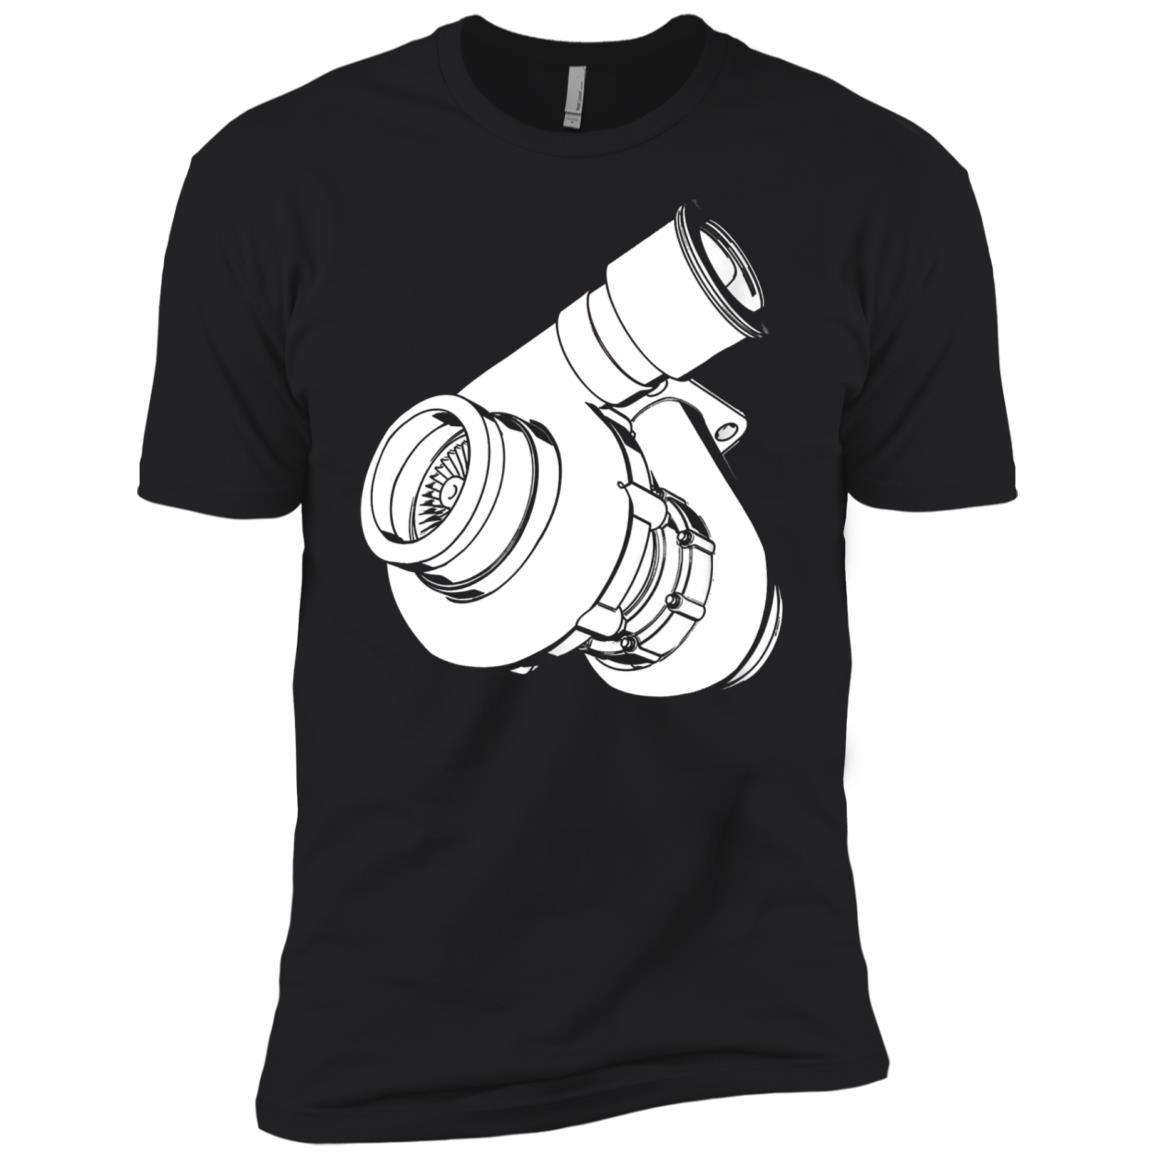 Boosted Turbocharger Diesel Truck Car Tee Men Short Sleeve T-Shirt